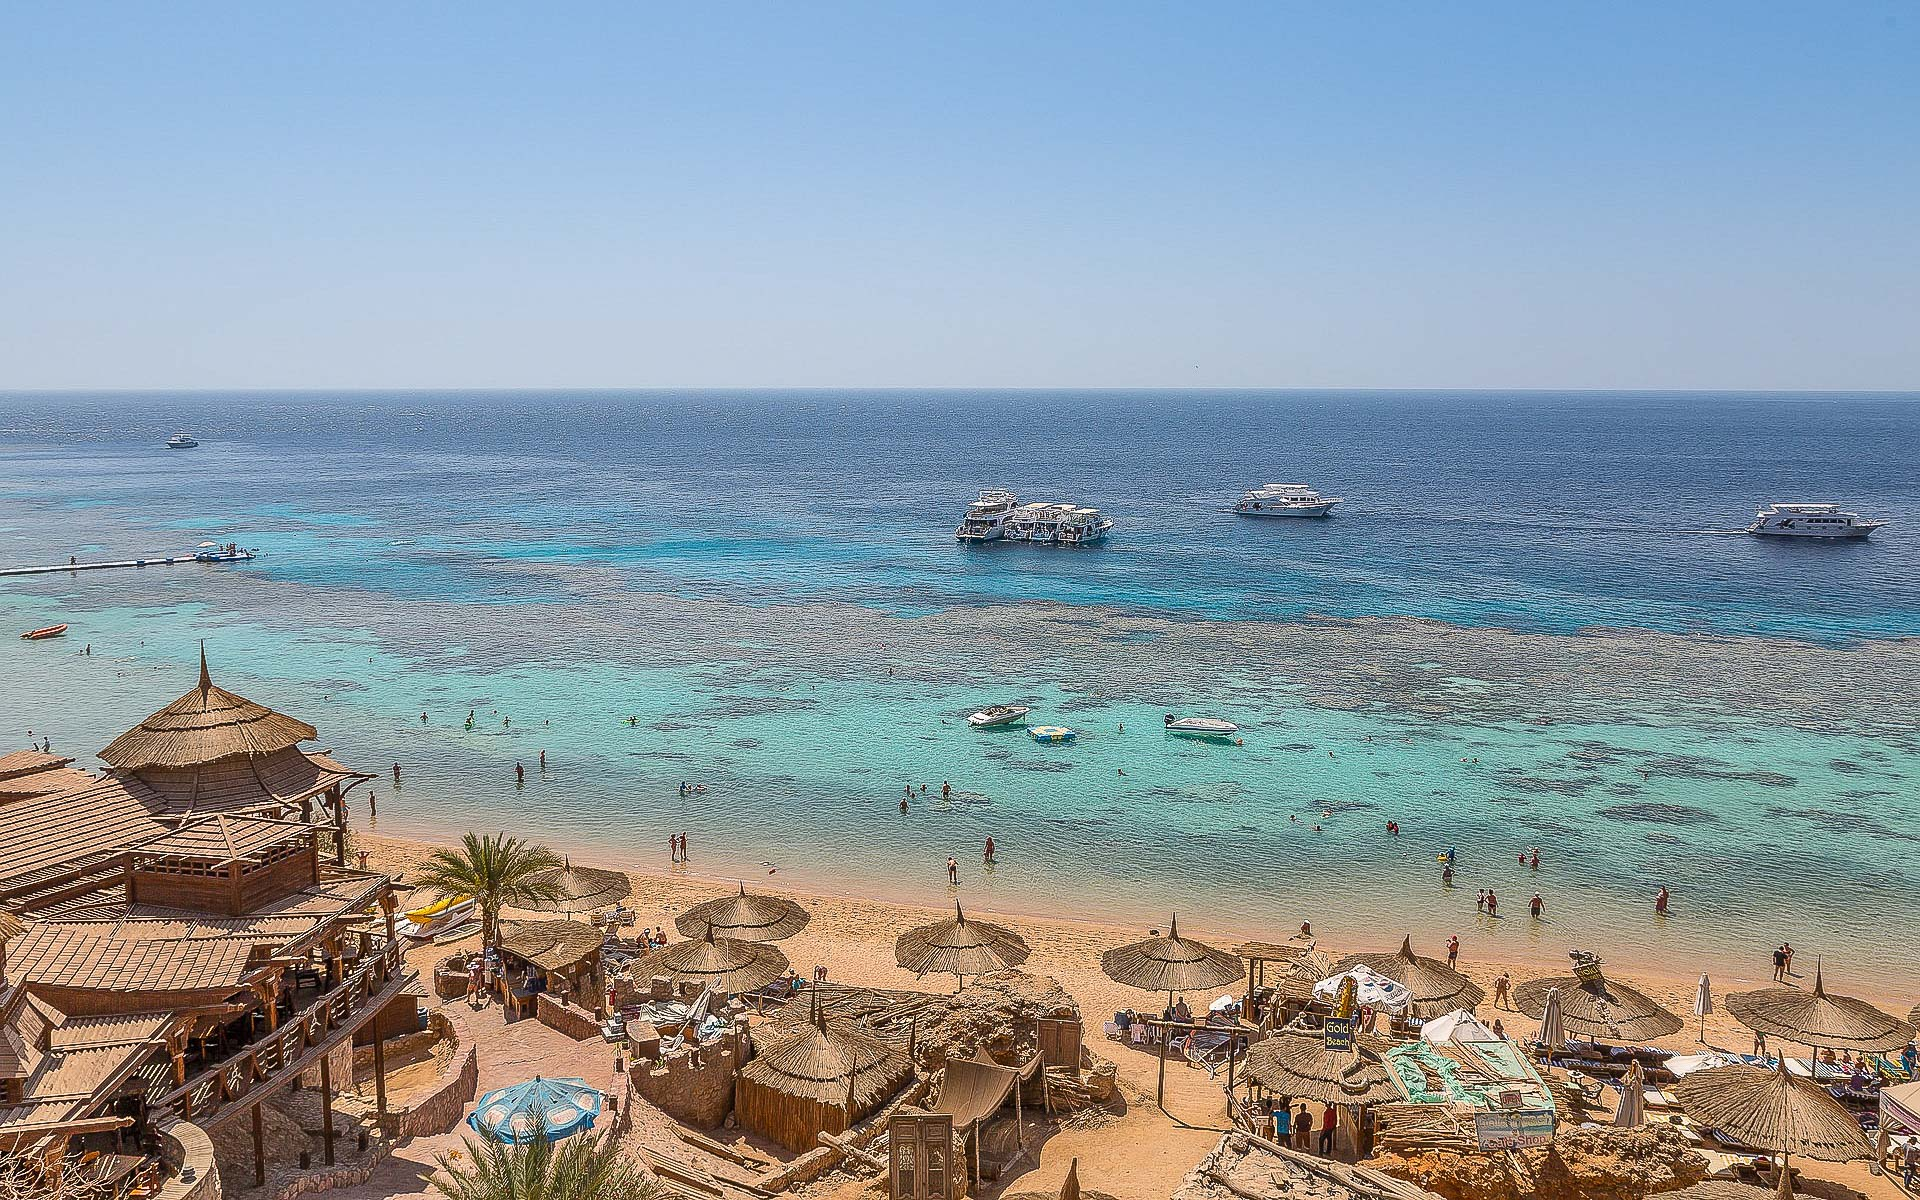 LesVoyageuses-organiser-voyage-egypte-conseils-23